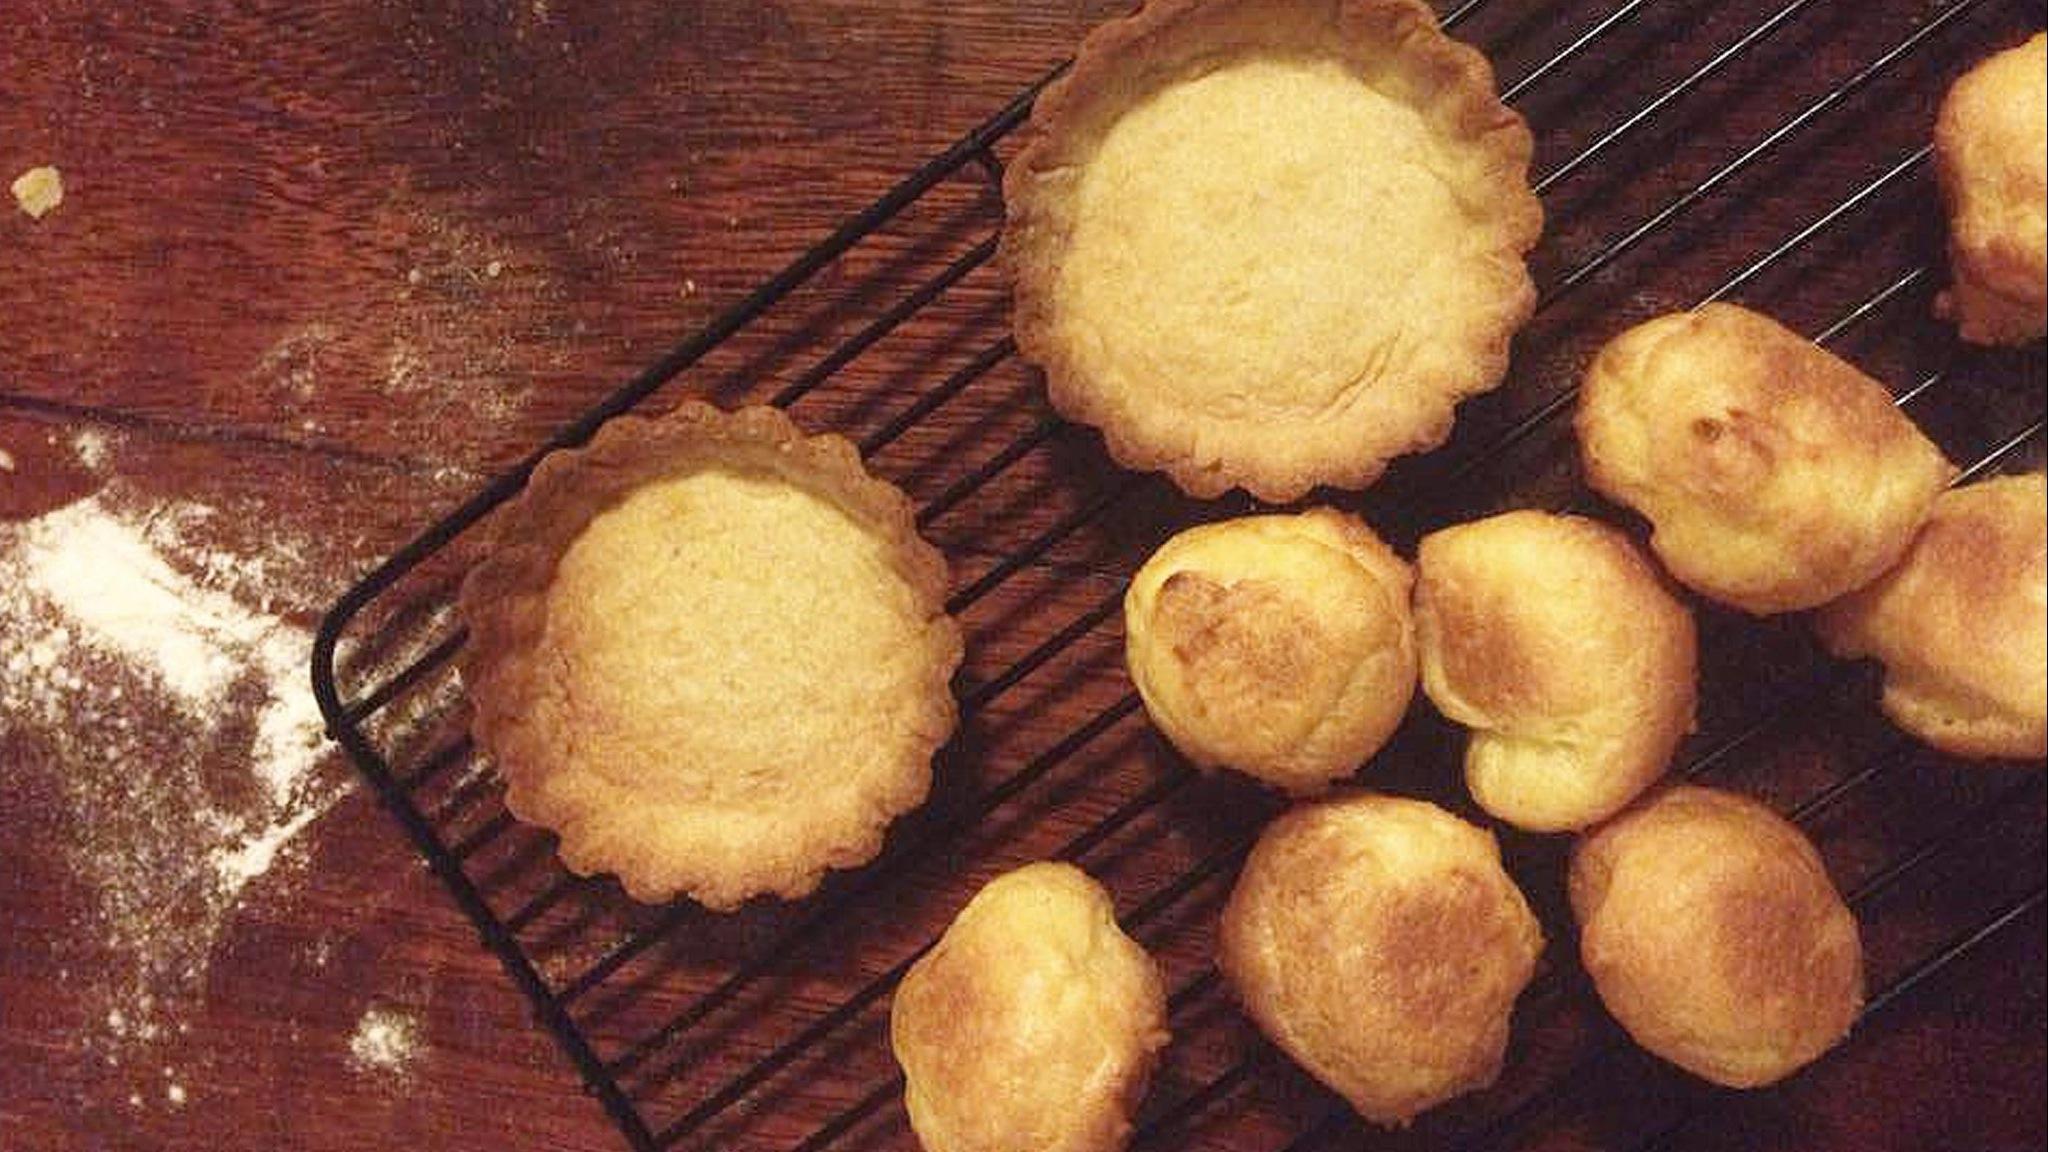 Beechworth Lost Arts Series - Gluten Free Pastry